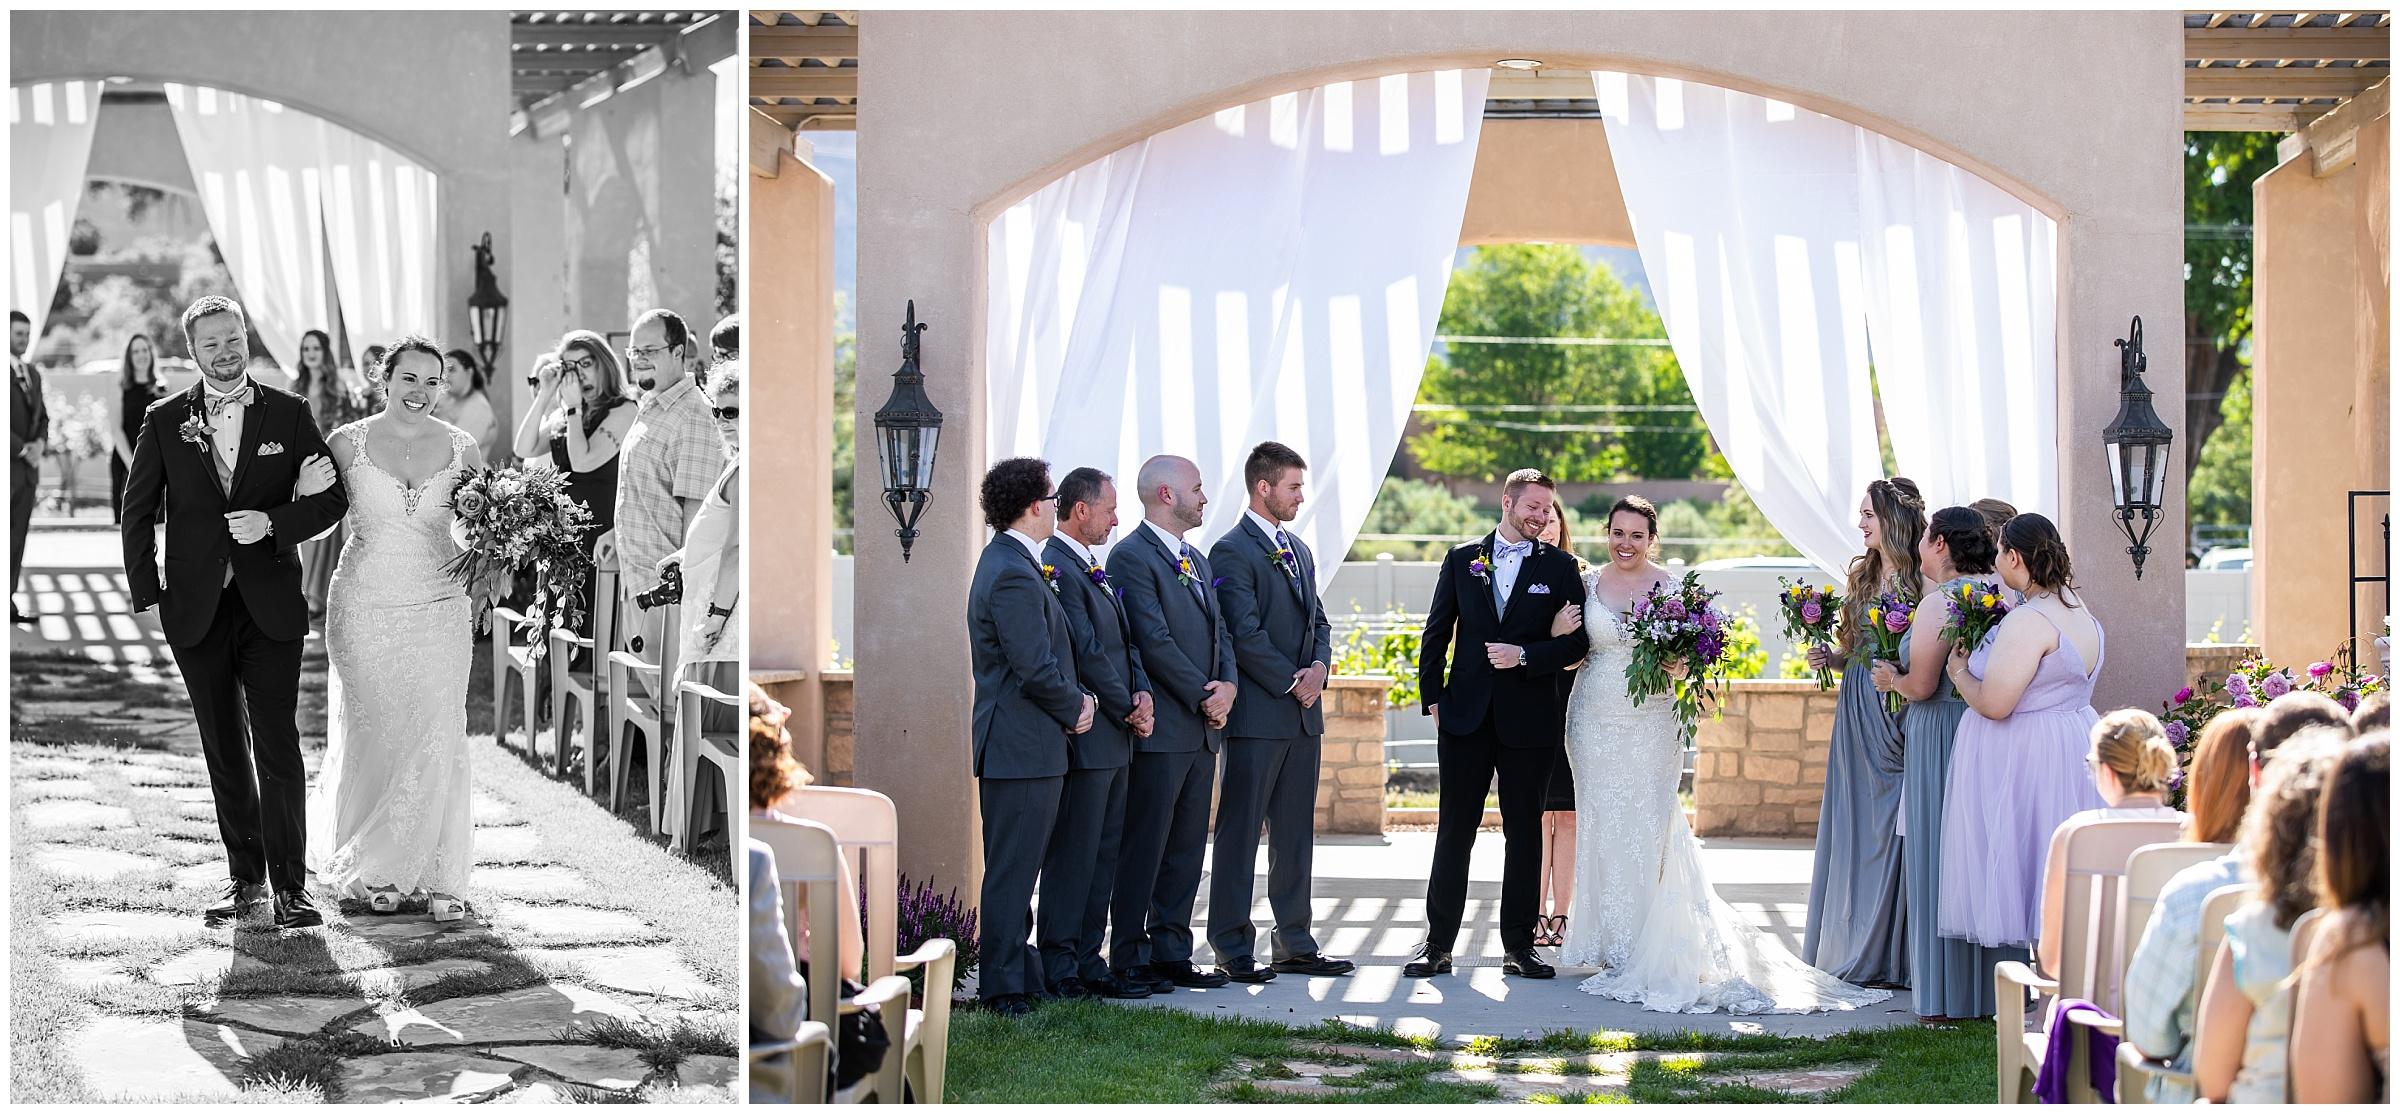 Grand Junction Wedding Photographer 0047.jpg